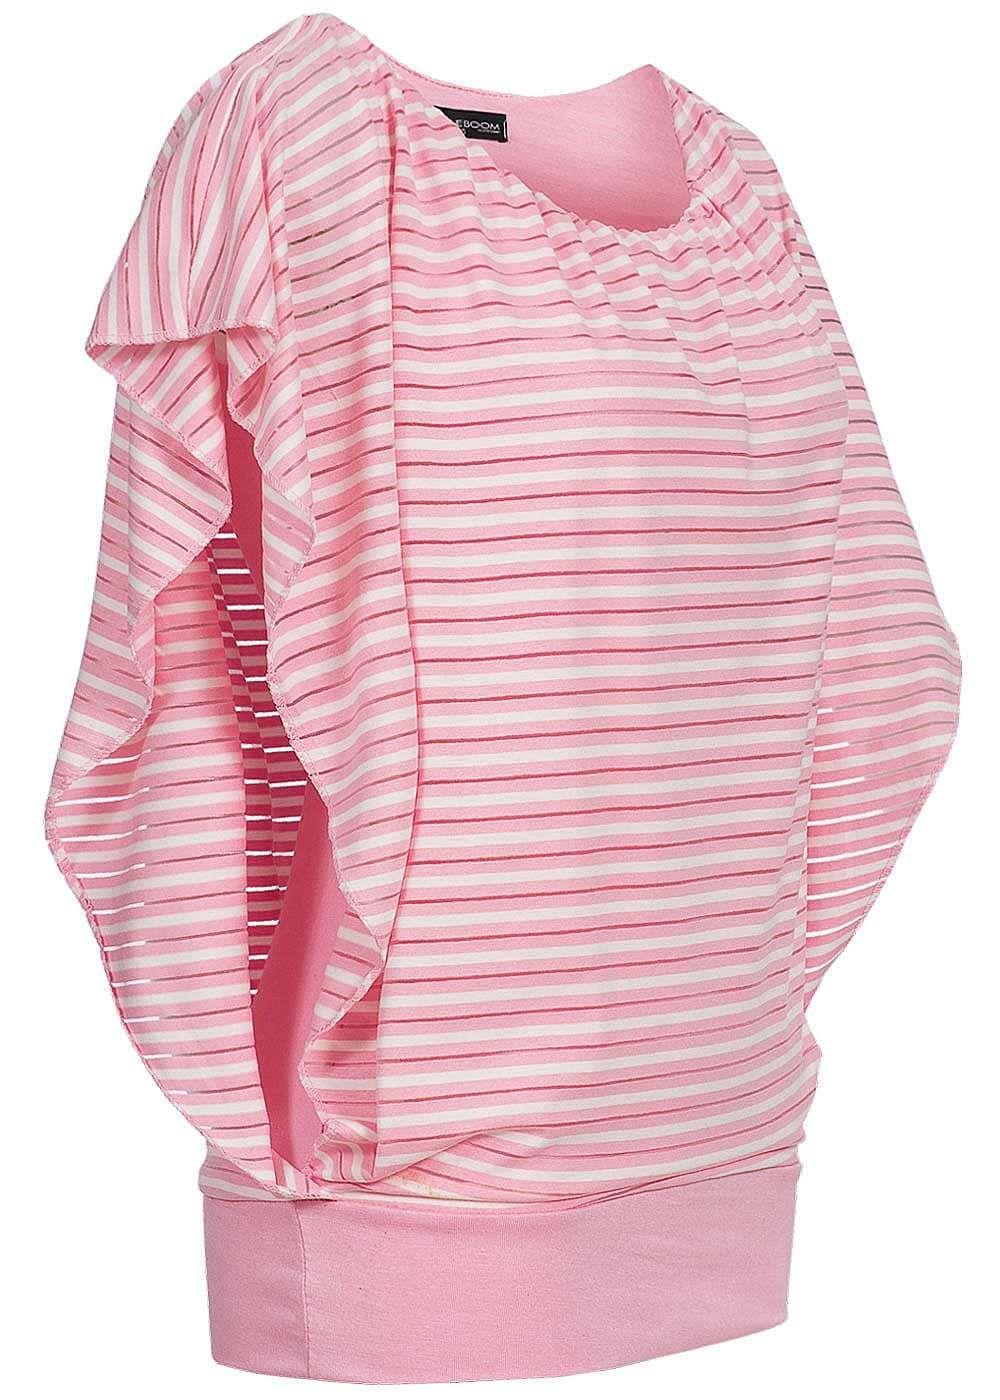 Styleboom Fashion Damen 2in1 Shirt U-Boot Ausschnitt gestreift rosa - 77onlineshop